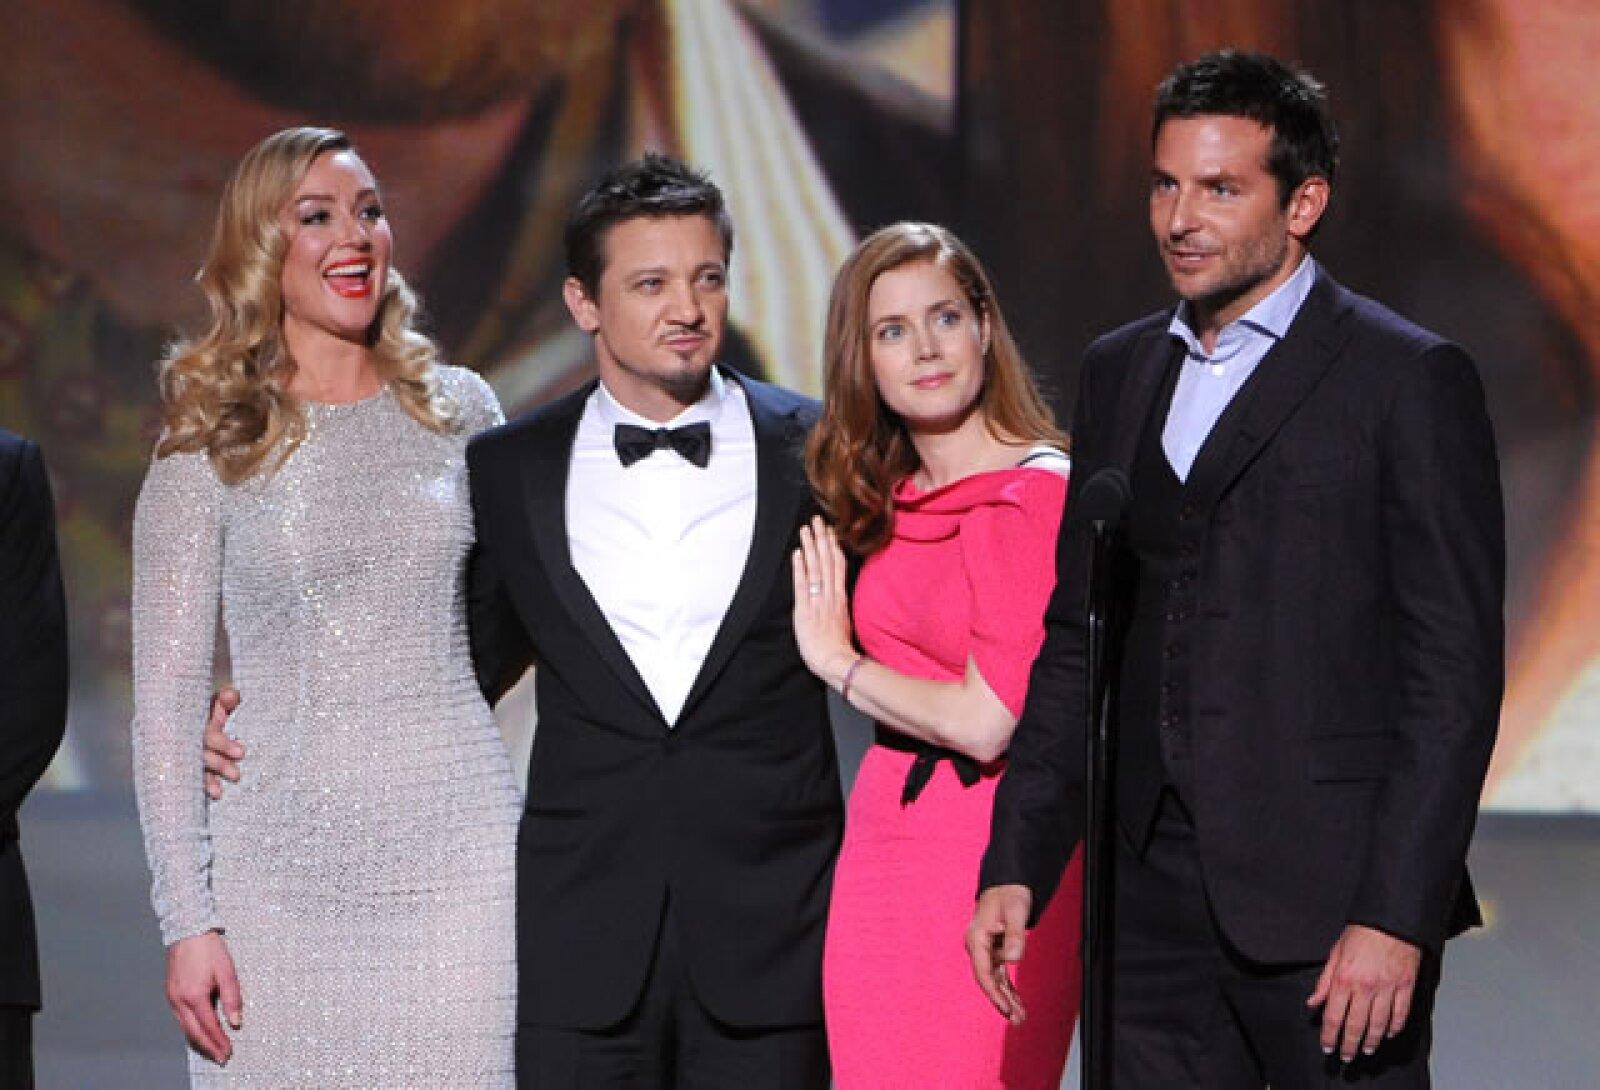 Elisabeth Rohm, Jeremy Renner, Amy Adams y Bradley Cooper.